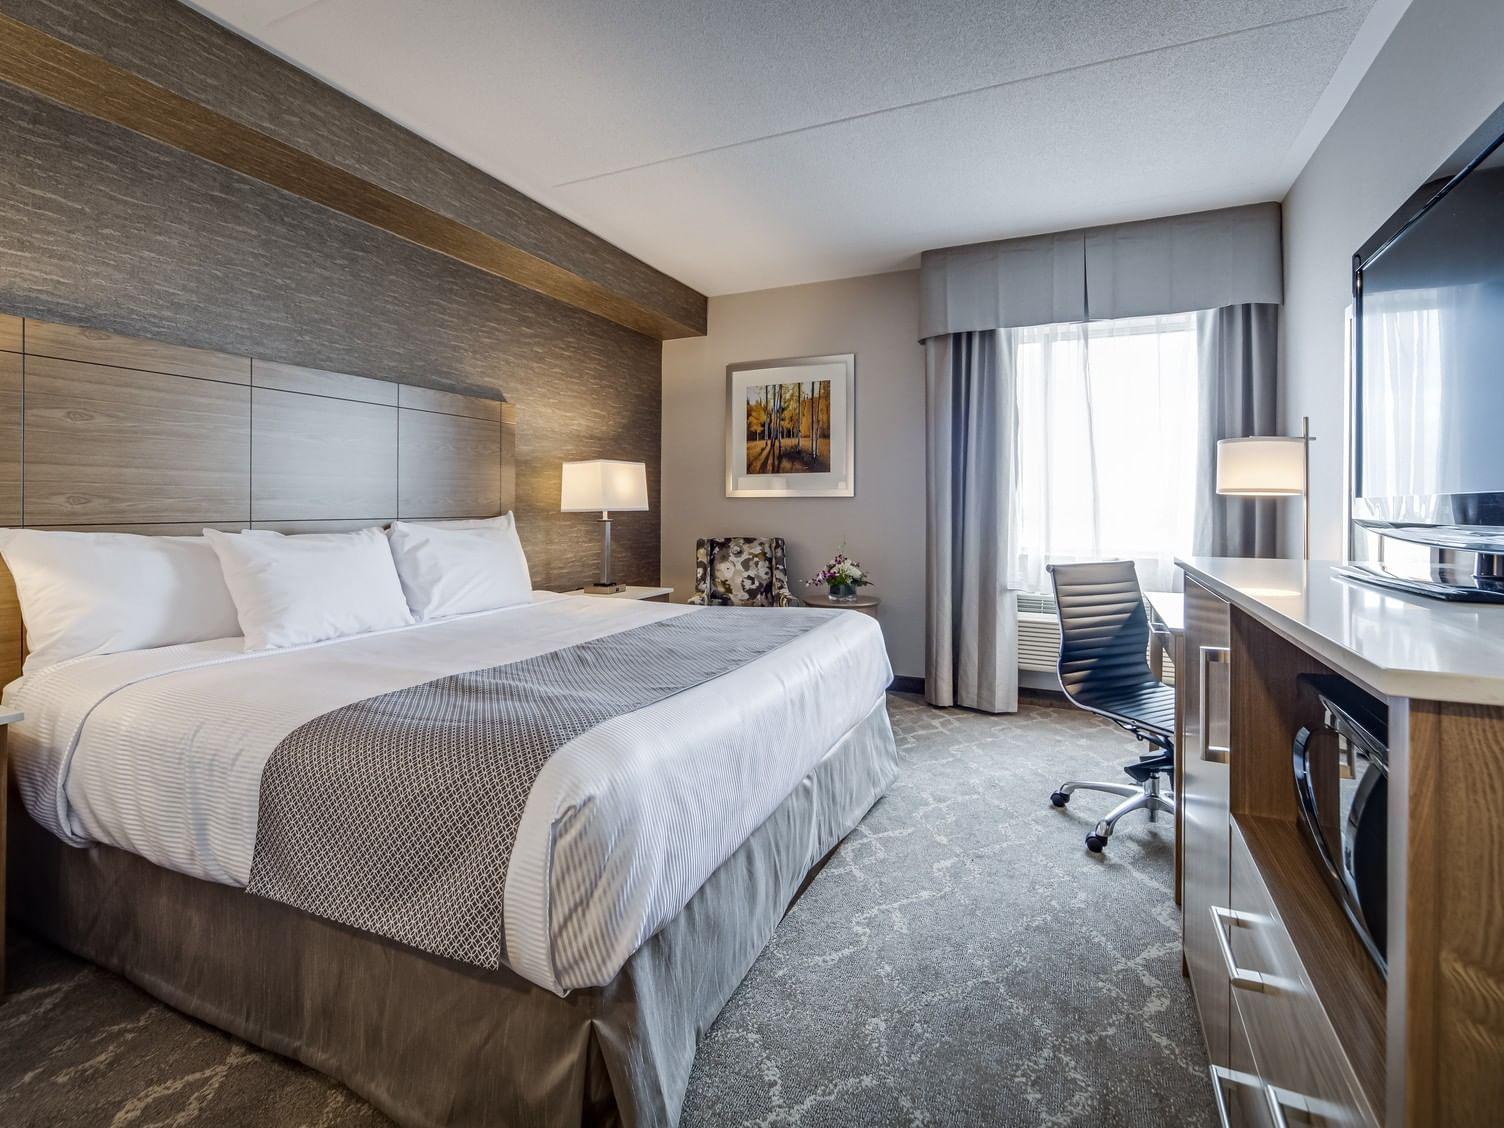 One king bed at Monte Carlo Inn Vaughan Suites